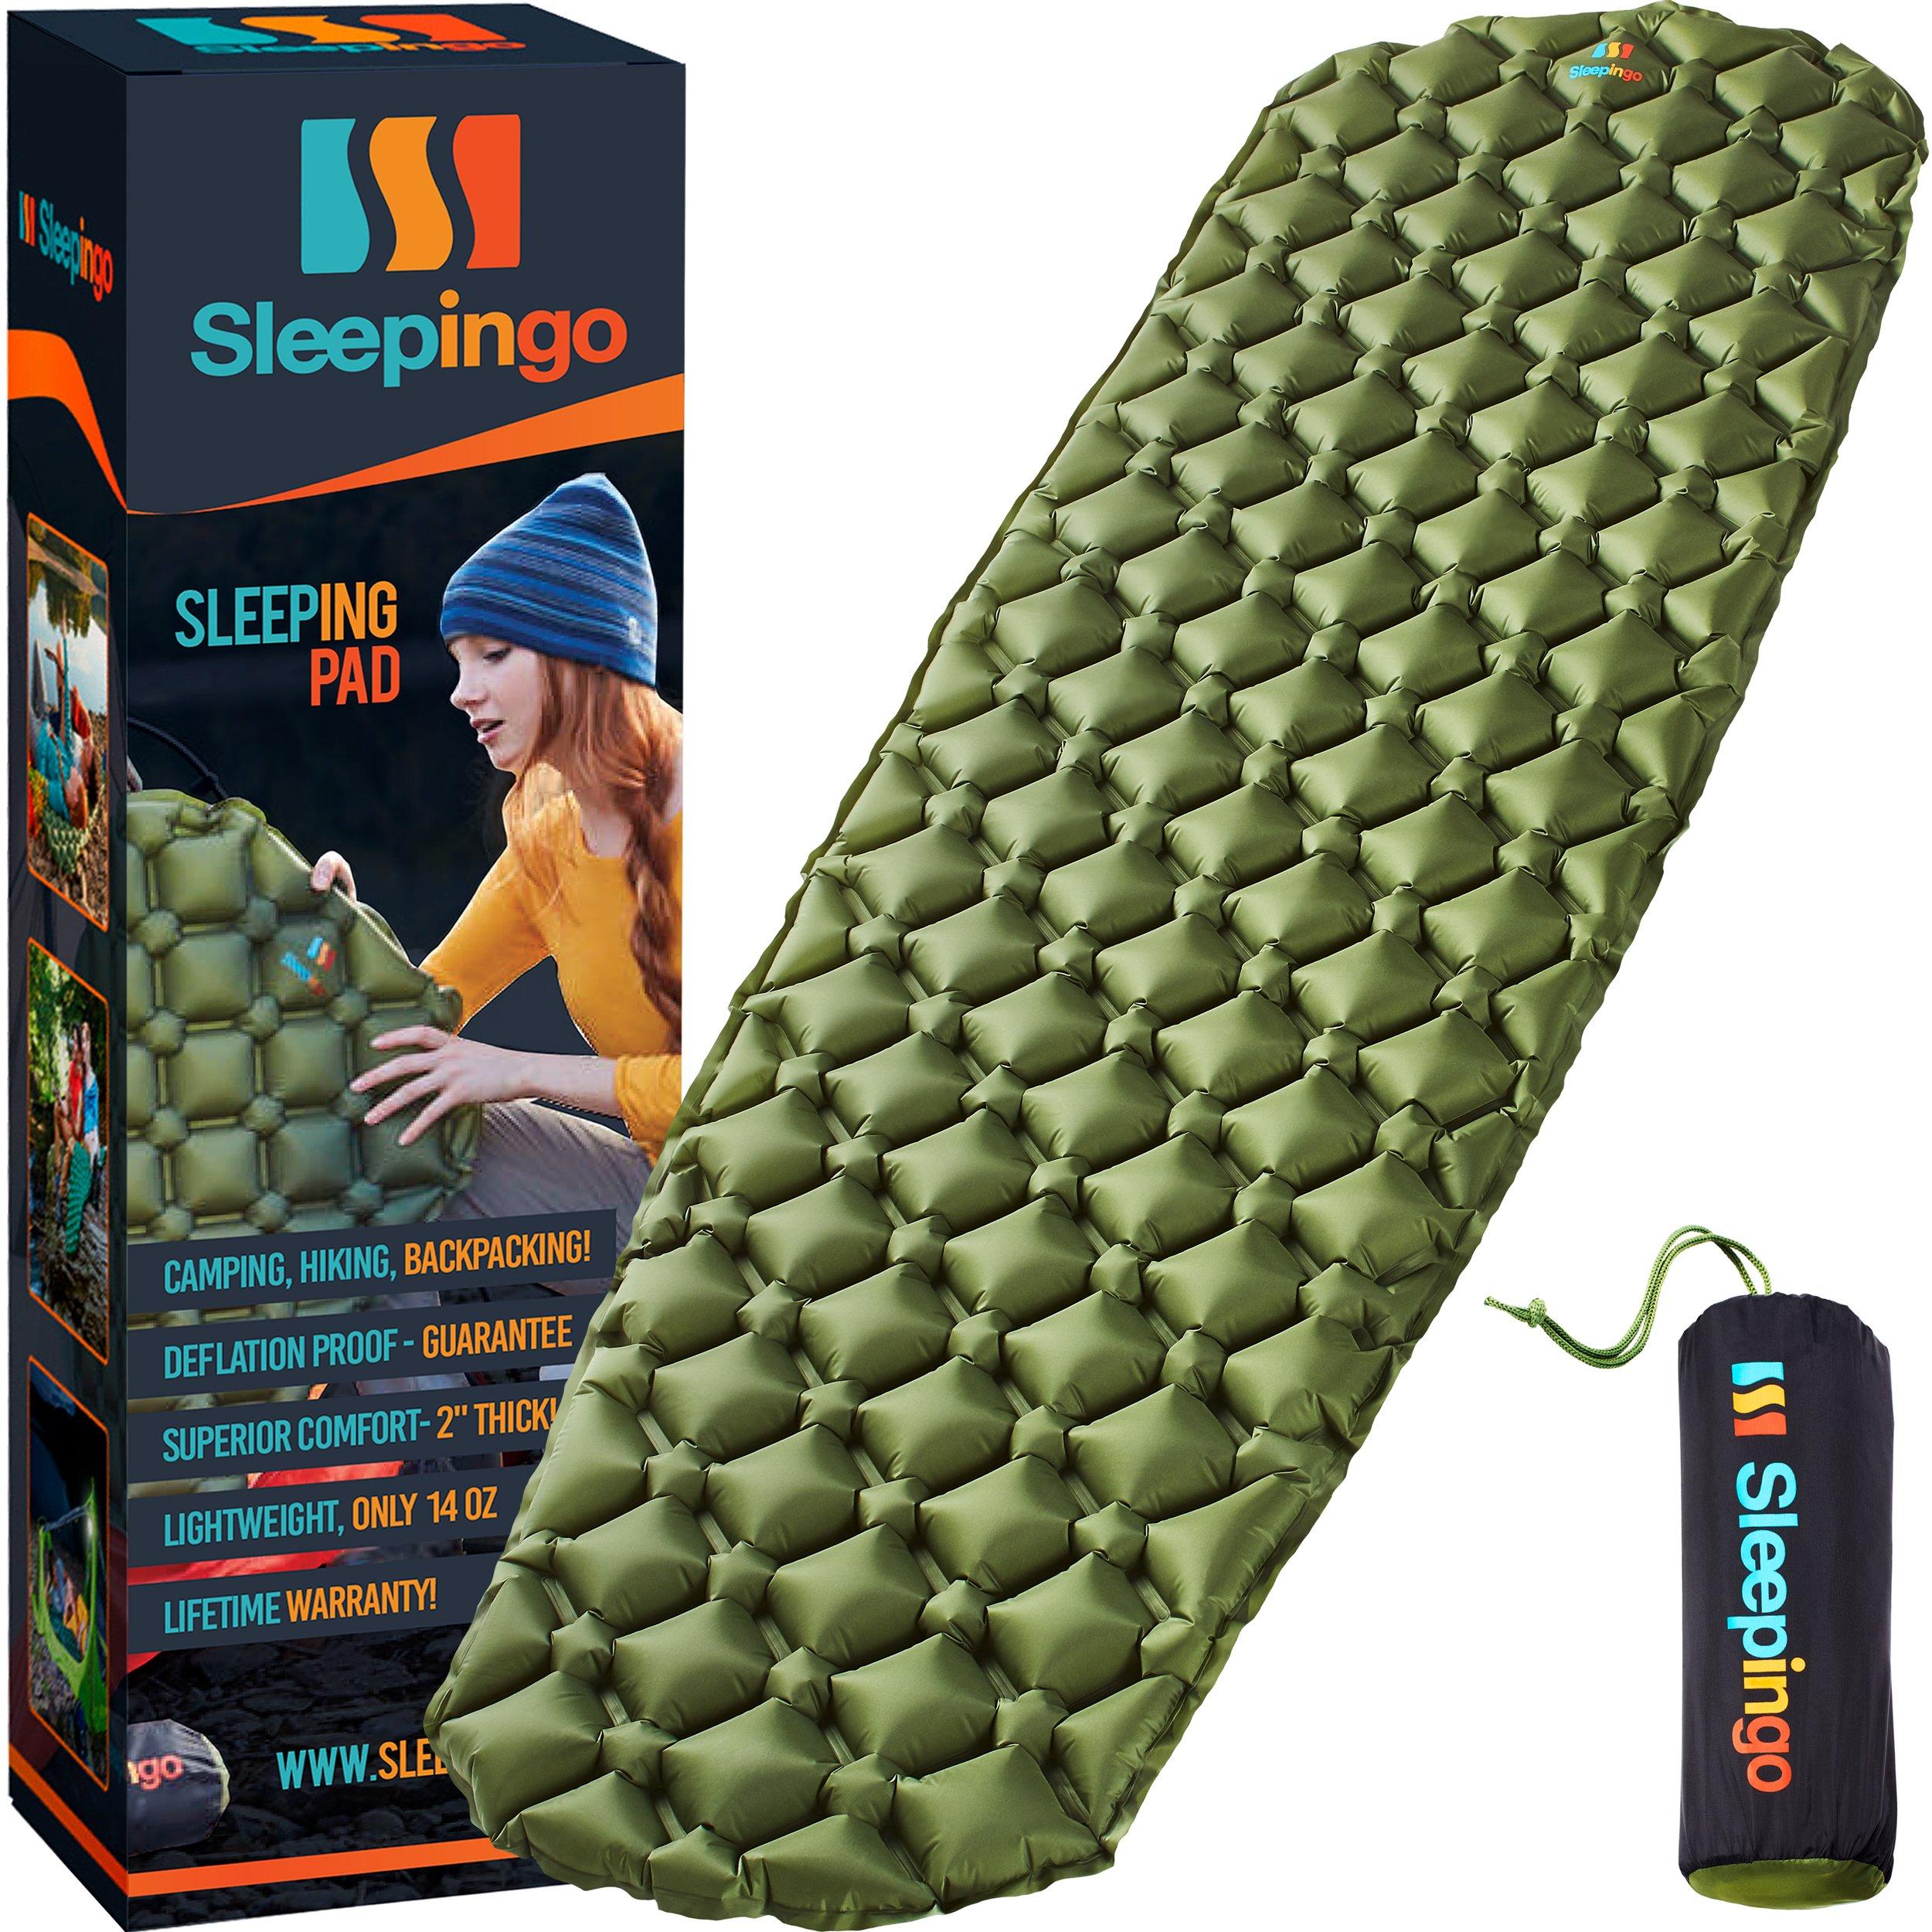 Sleepingo Camping Sleeping Pad Backpacking